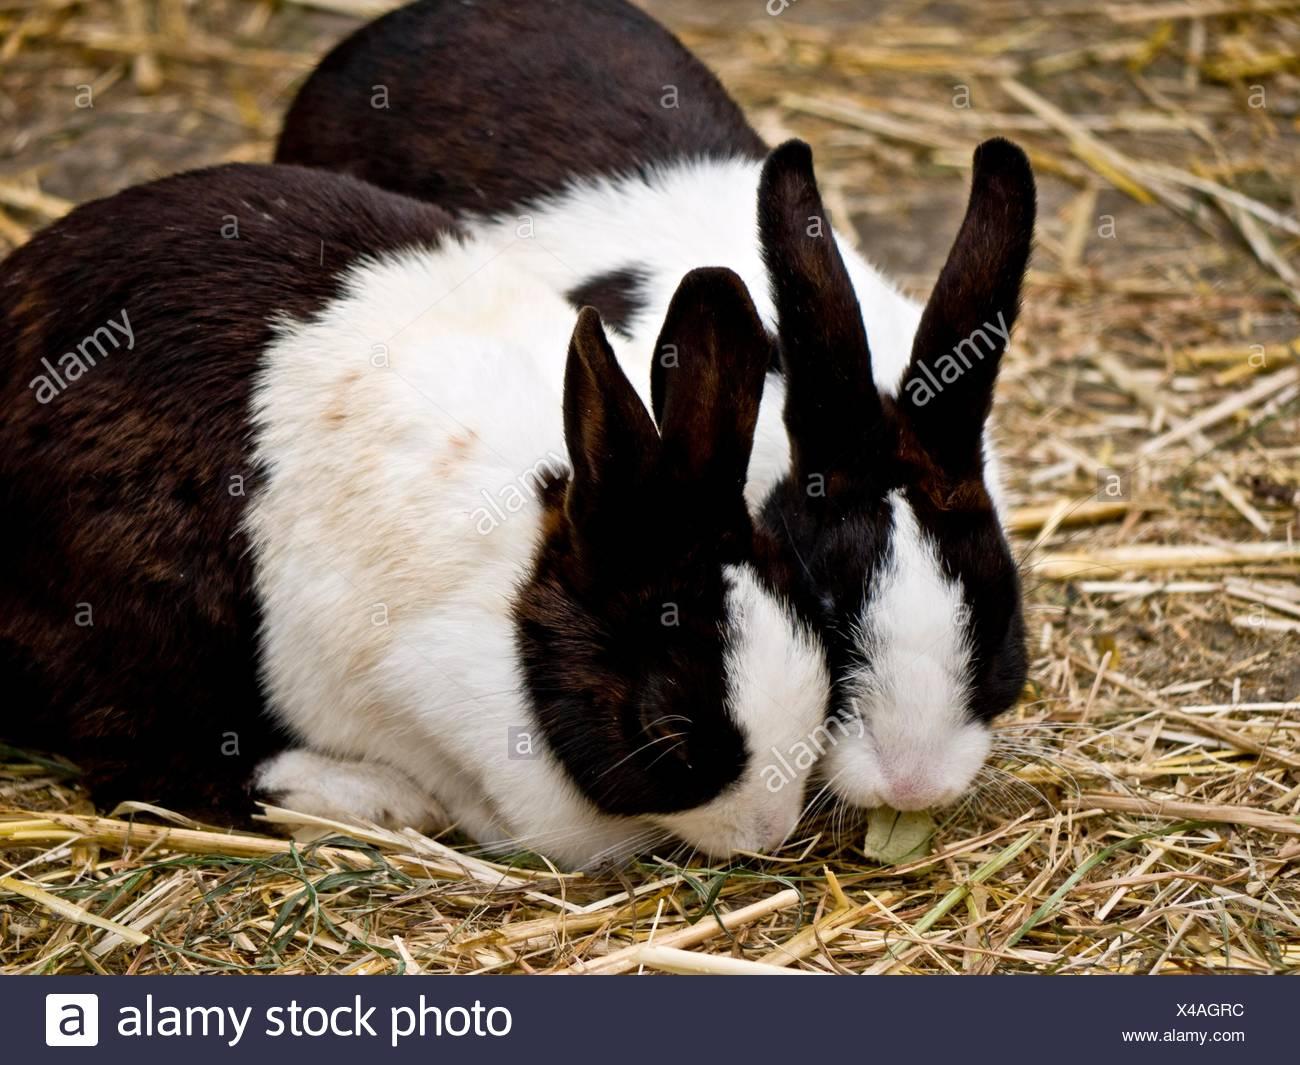 mammals Stock Photo